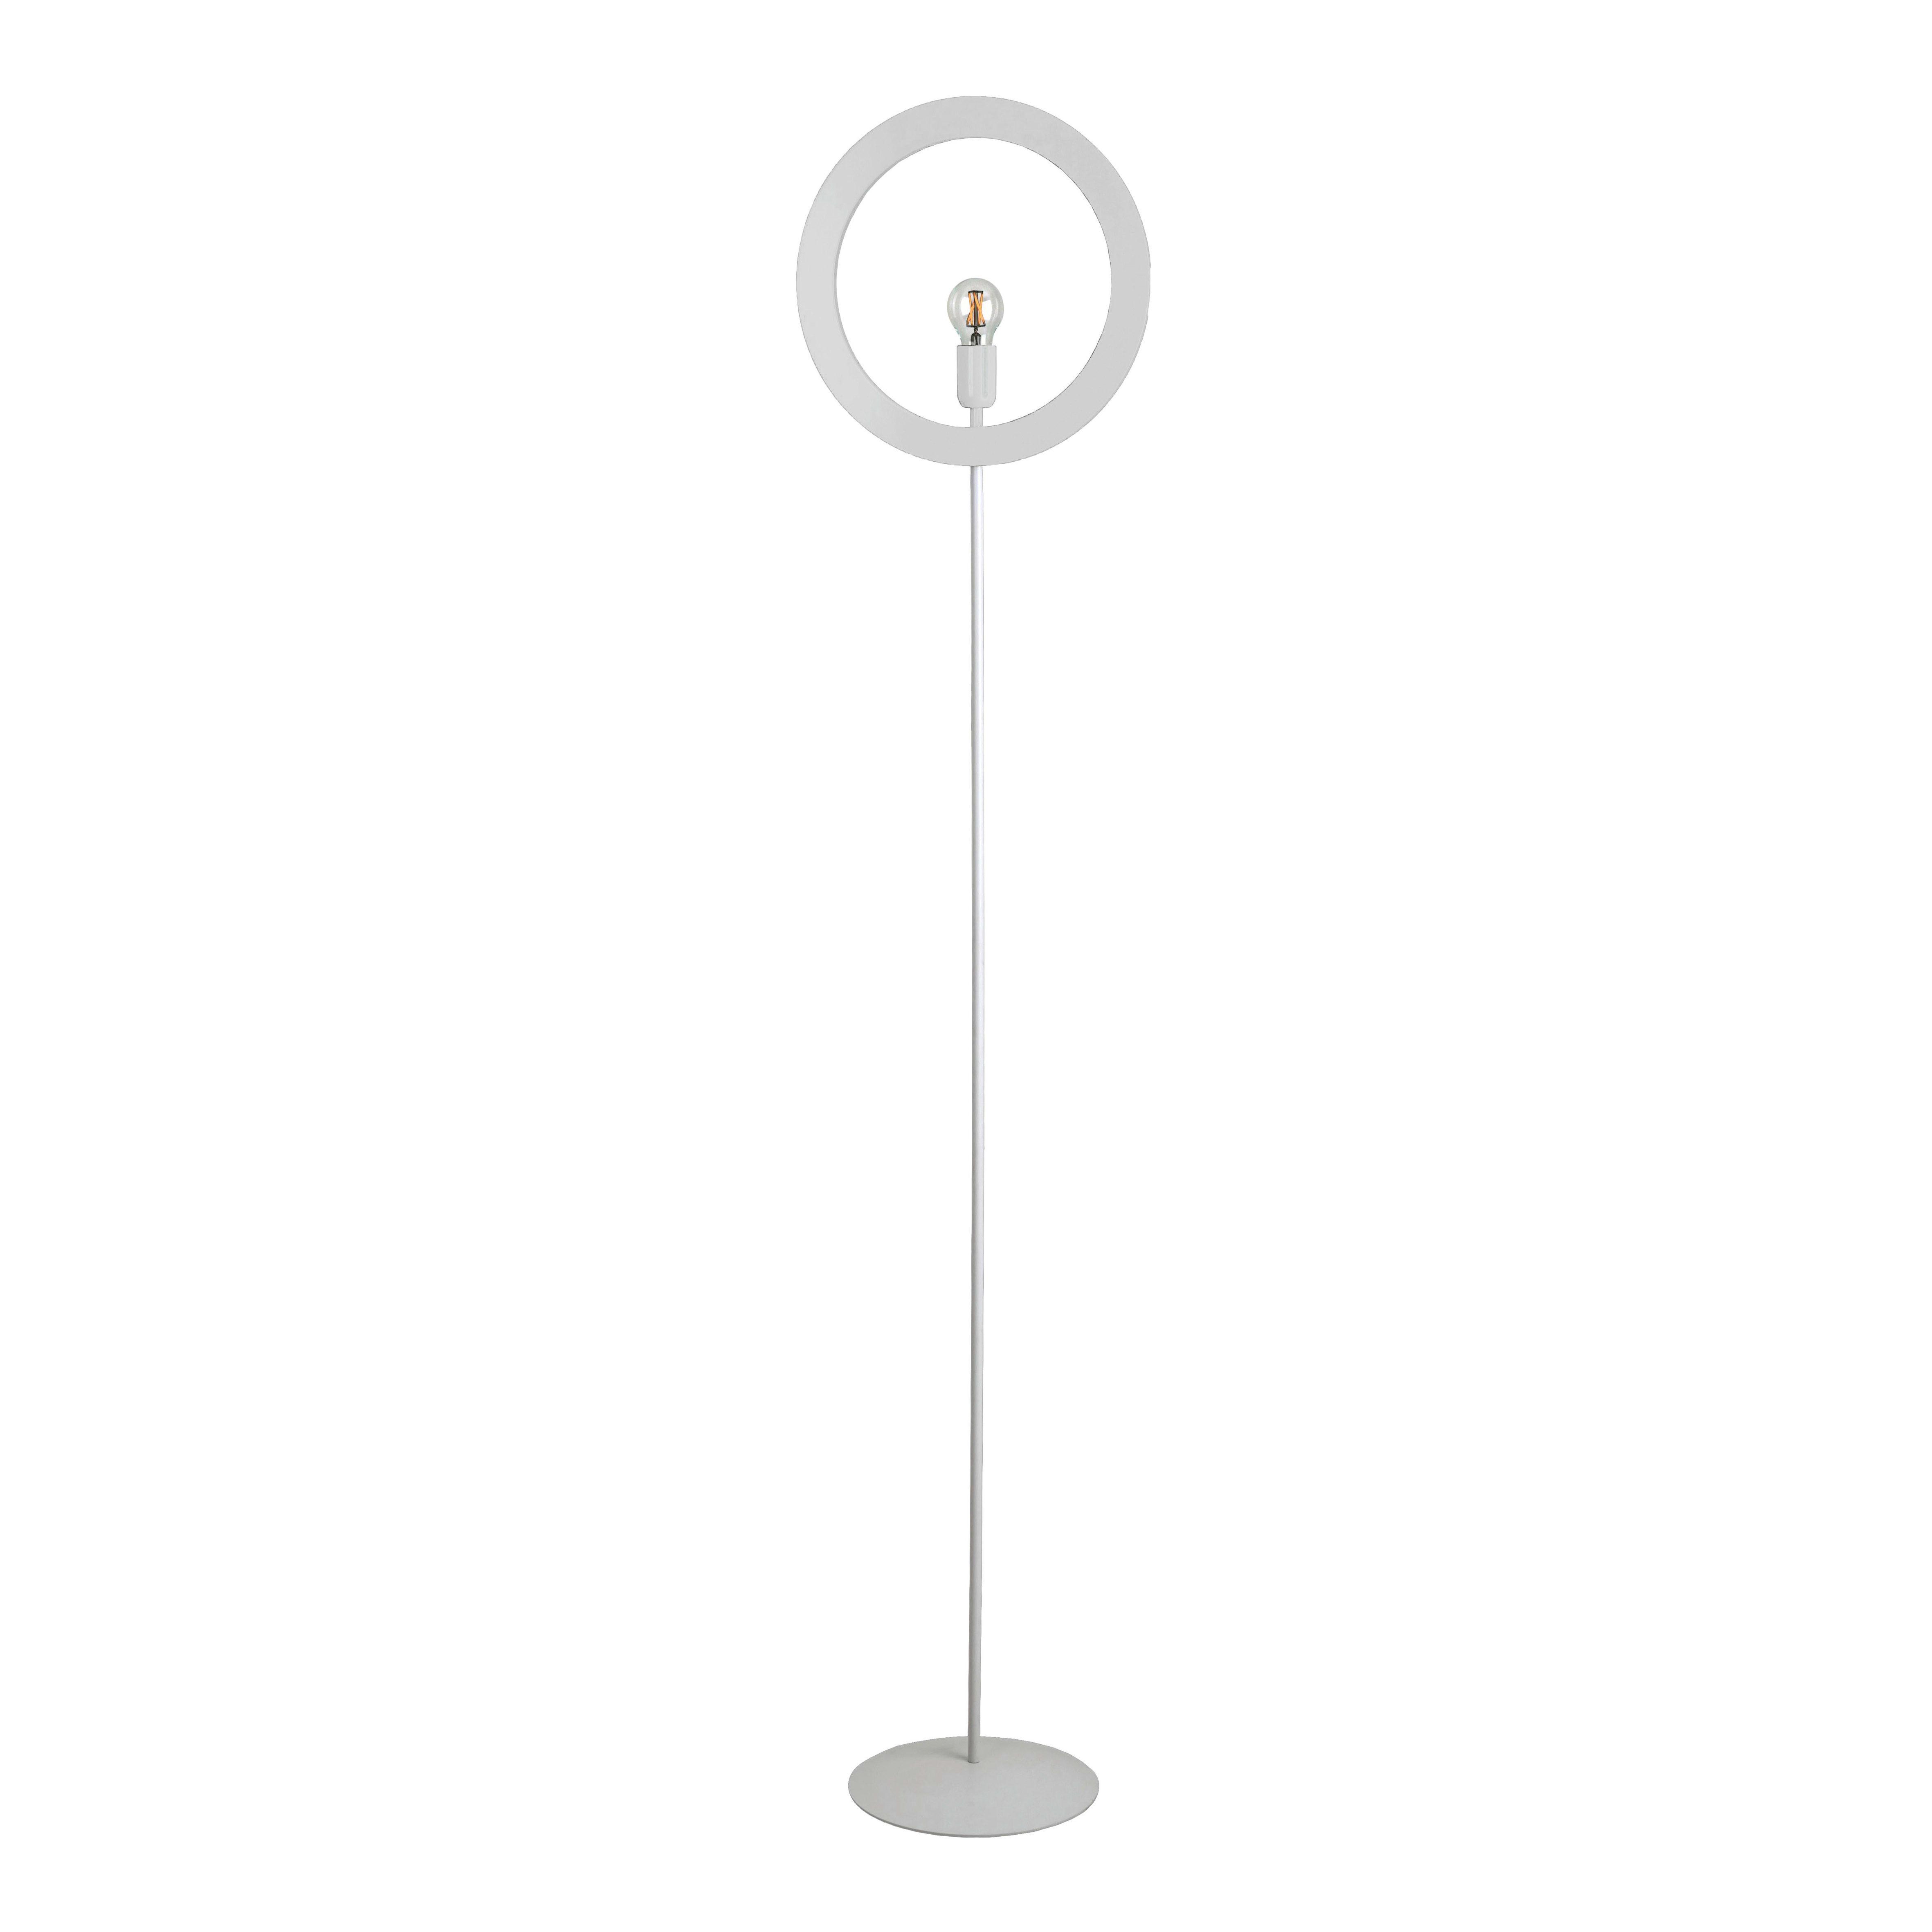 Finestra Oblò Leroy Merlin lampada da terra oblo' bianco, in ferro, h186cm, max42w